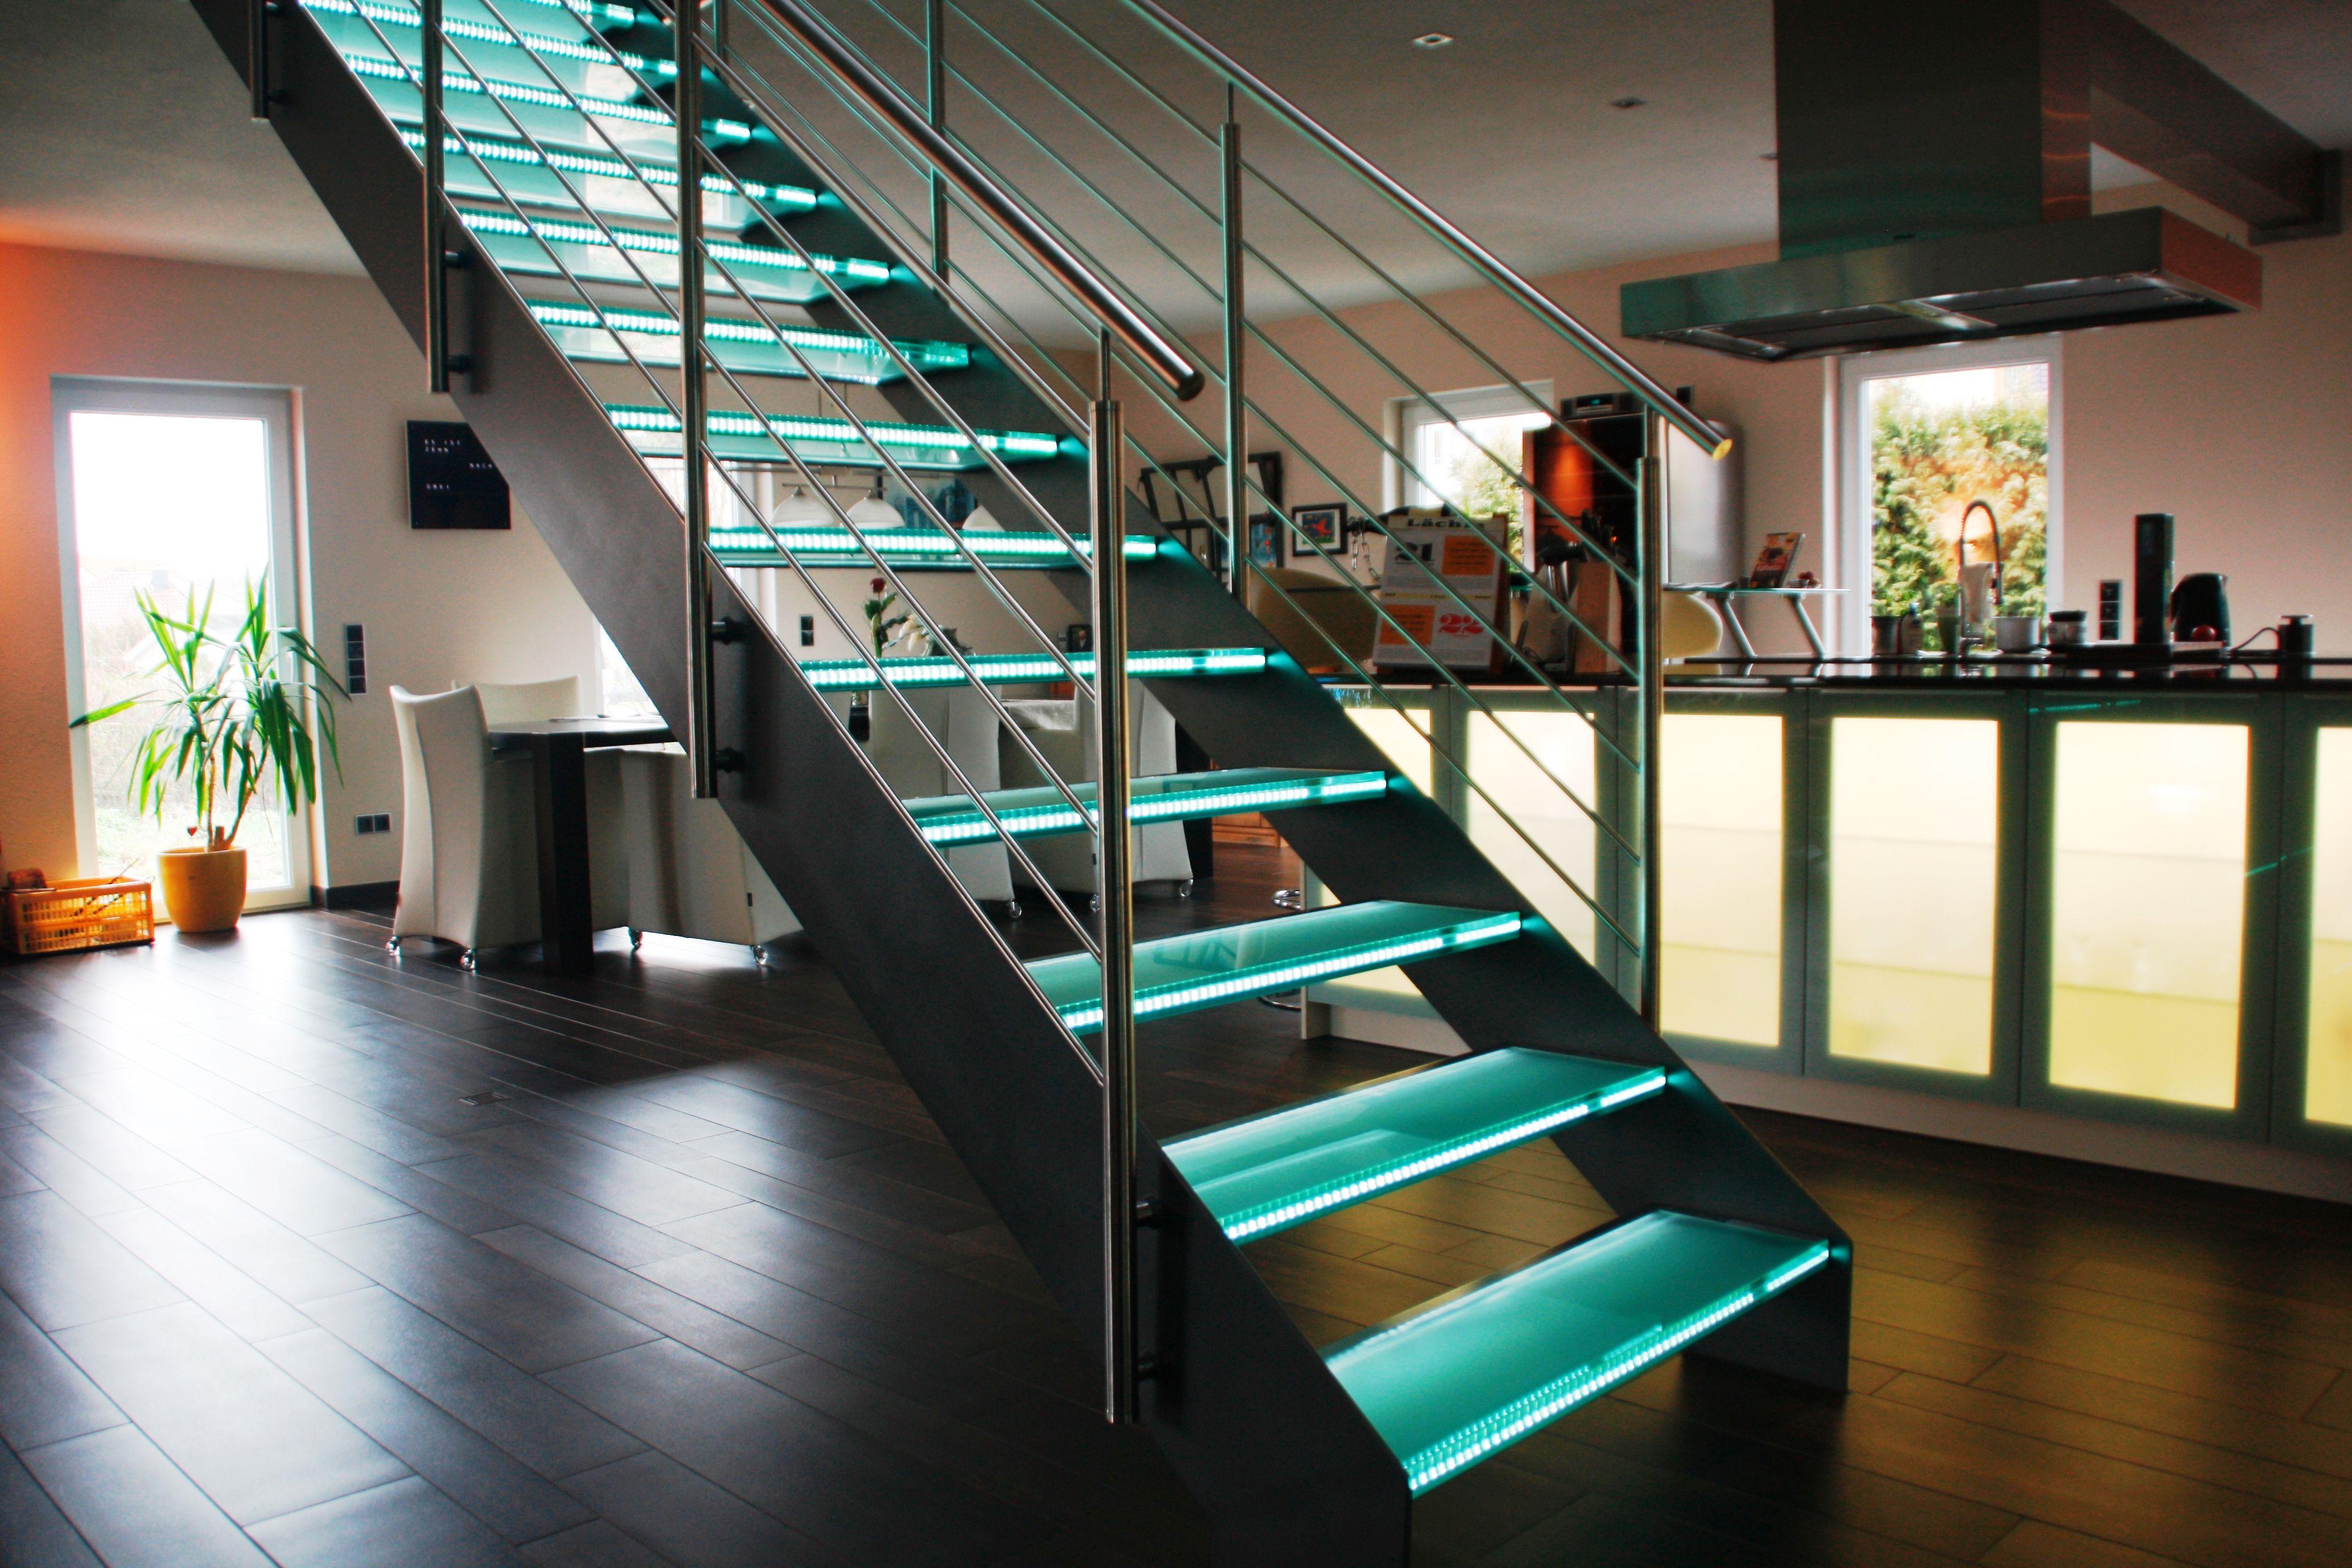 glastreppe n rnberg blechwangentreppe mit beleuchteten glasstufen und liegendem. Black Bedroom Furniture Sets. Home Design Ideas